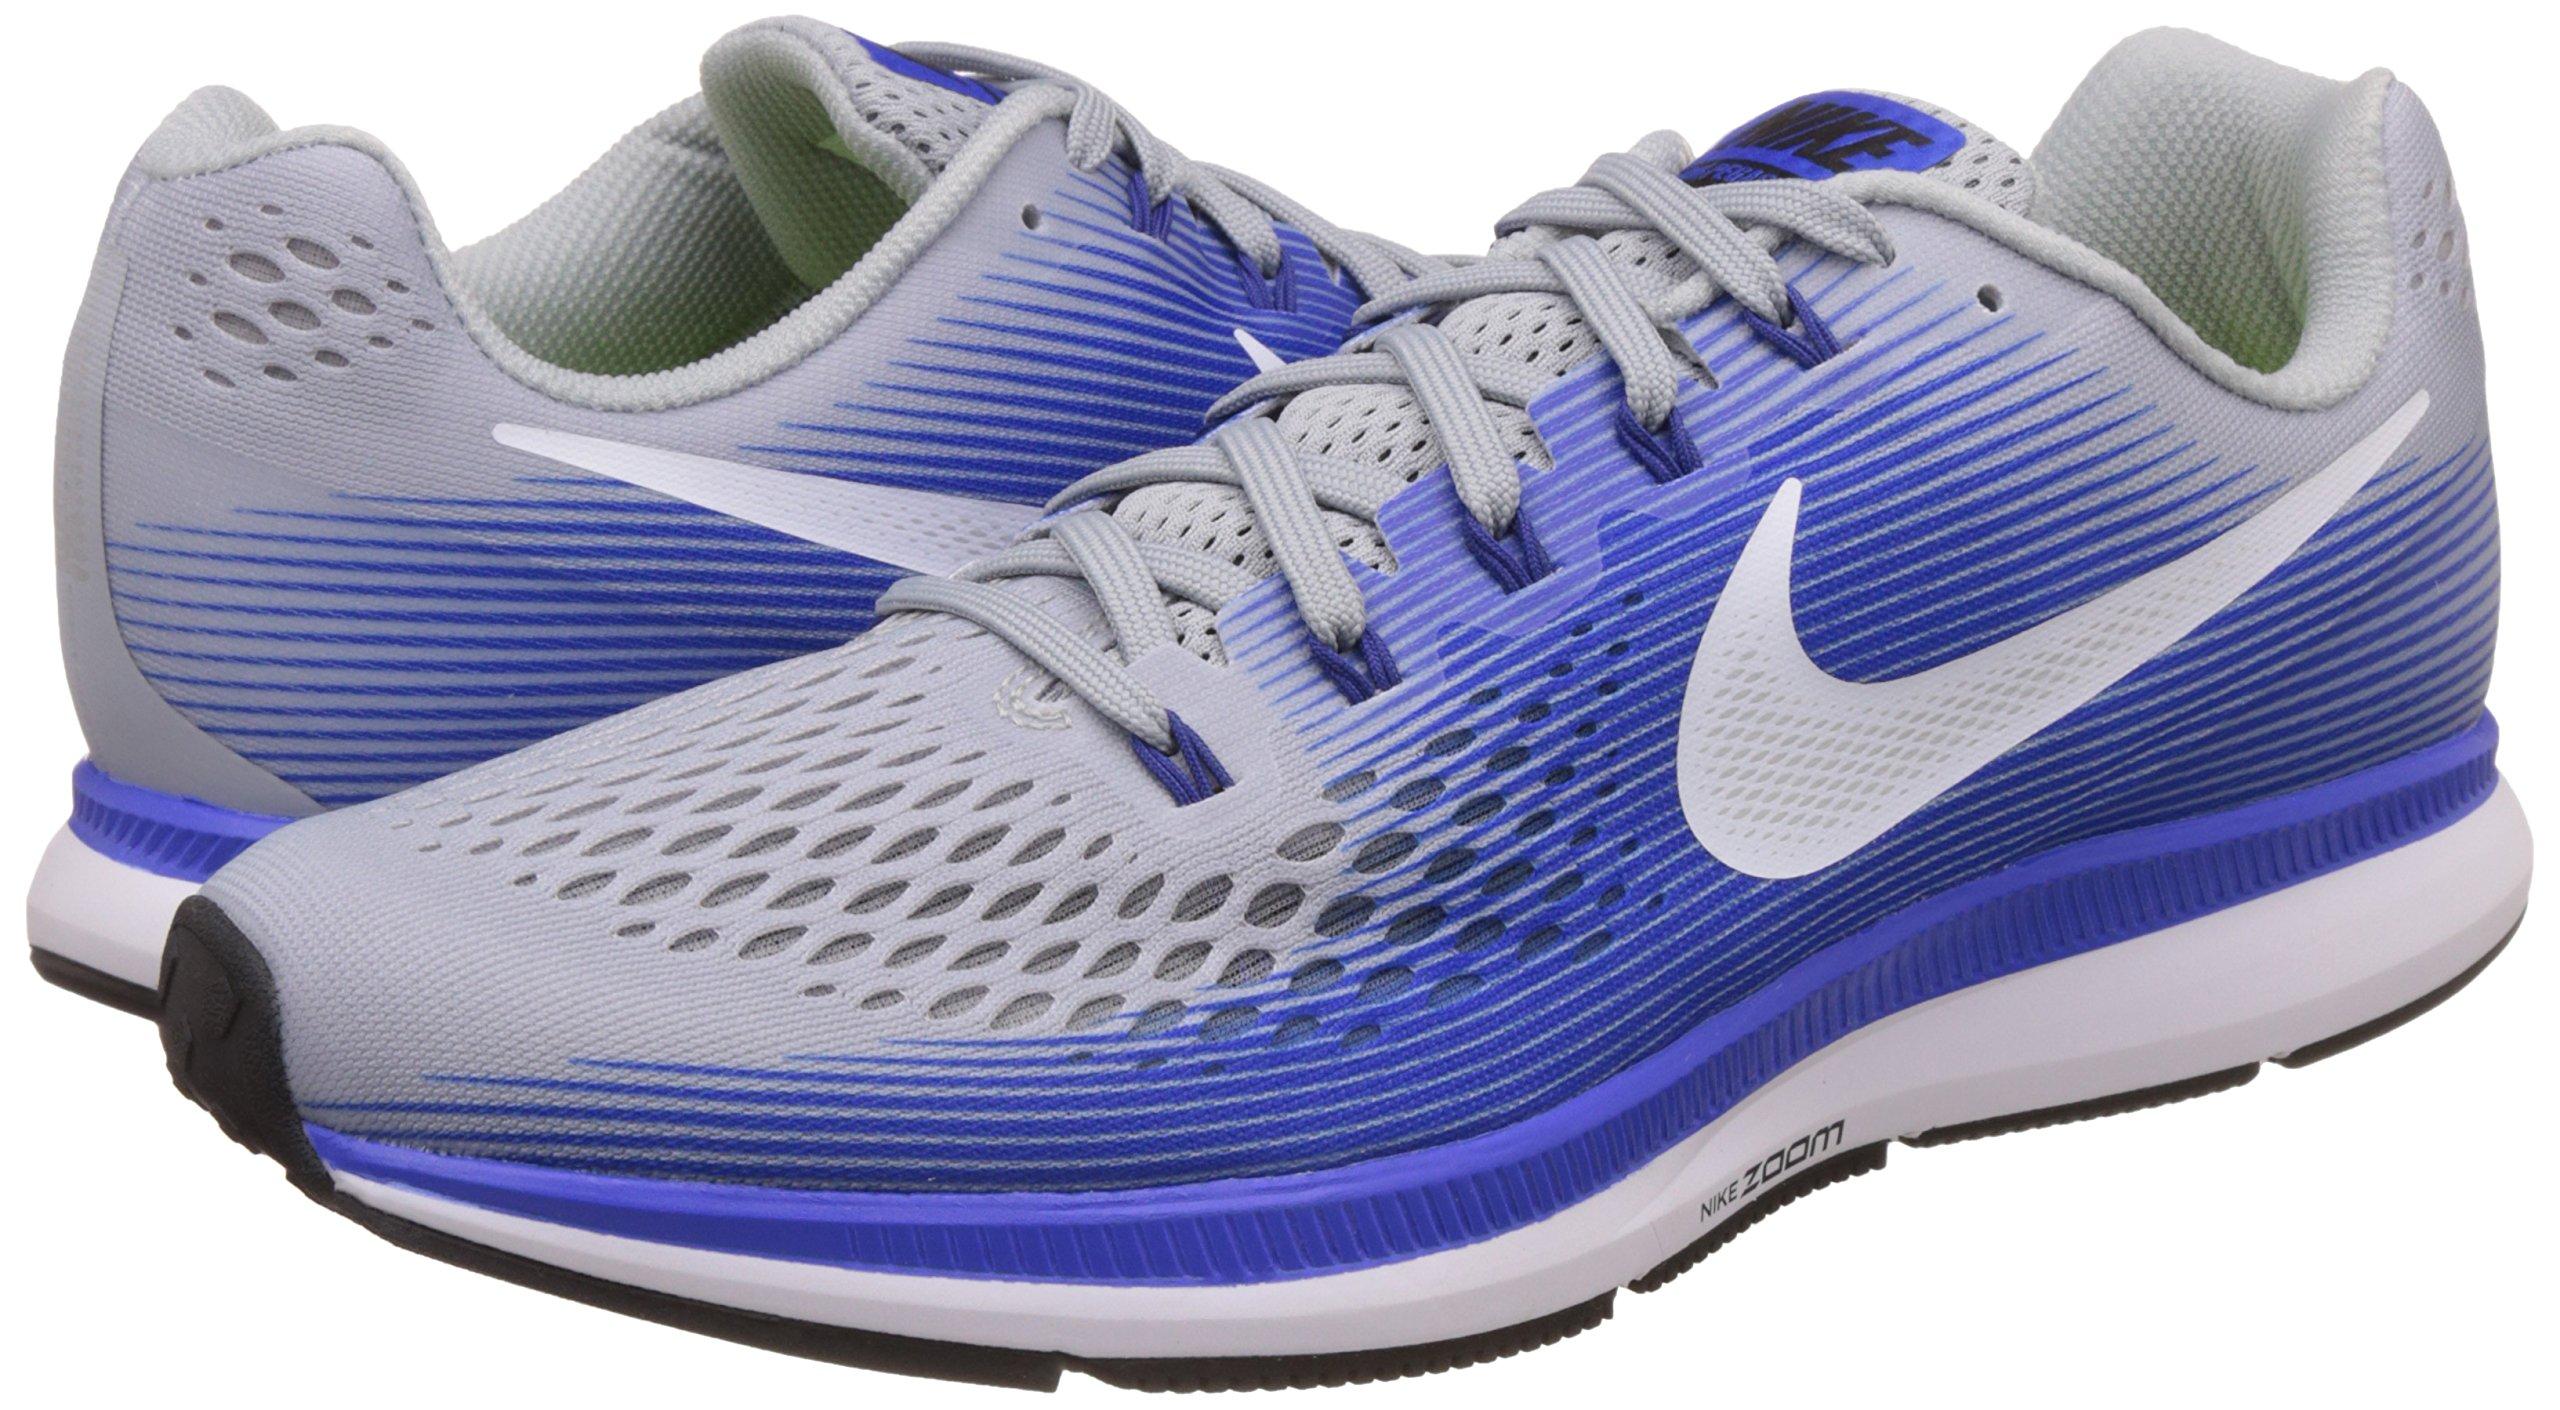 NIKE Mens Air Zoom Pegasus 34 Running Shoe (11 M US, Wolf Grey/White/Racer Blue) by Nike (Image #5)